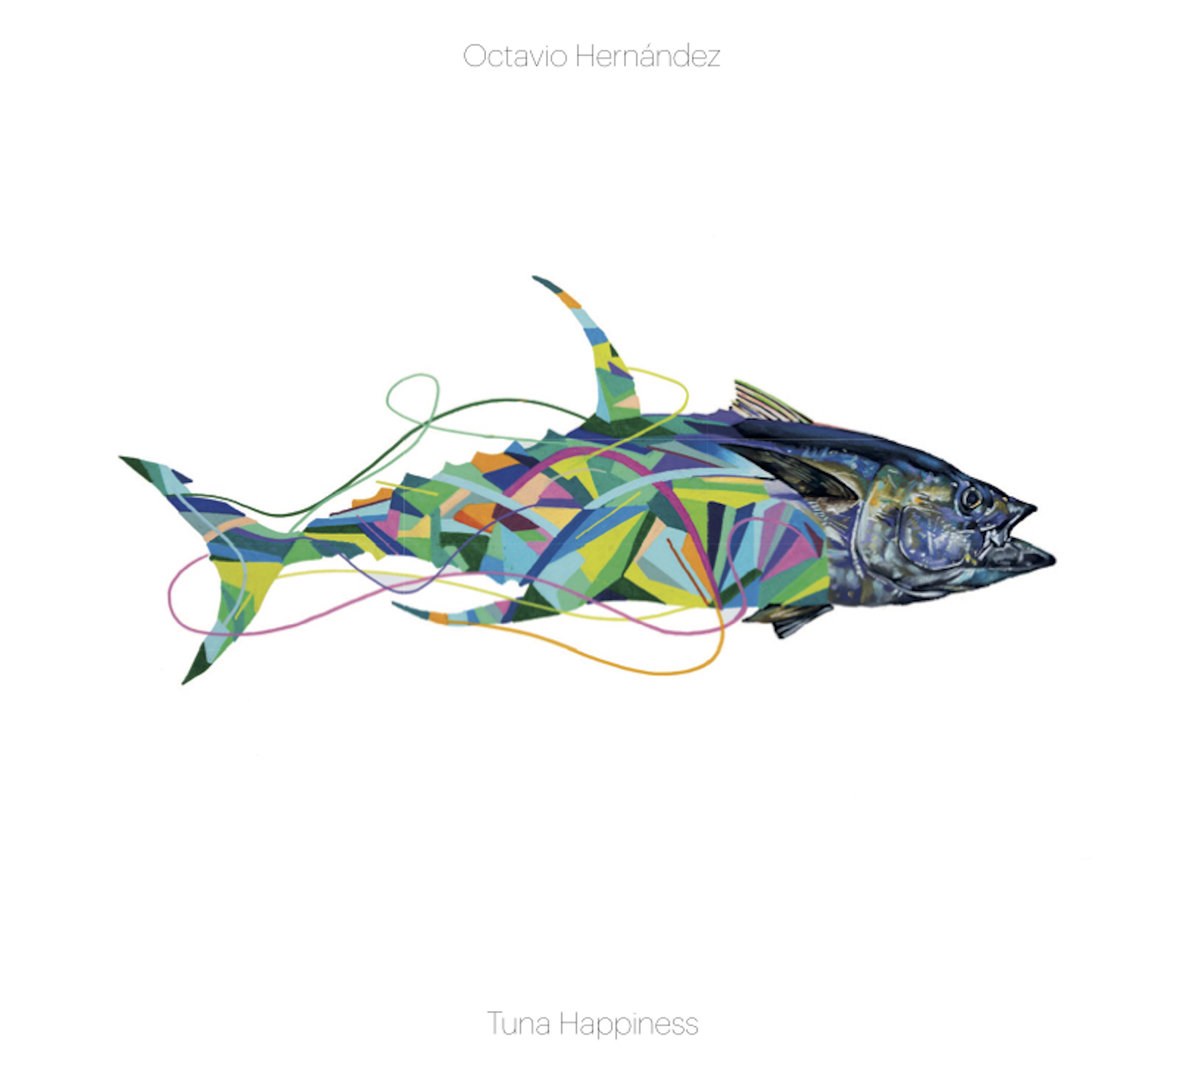 'Tuna Happiness', Octavio Hernández